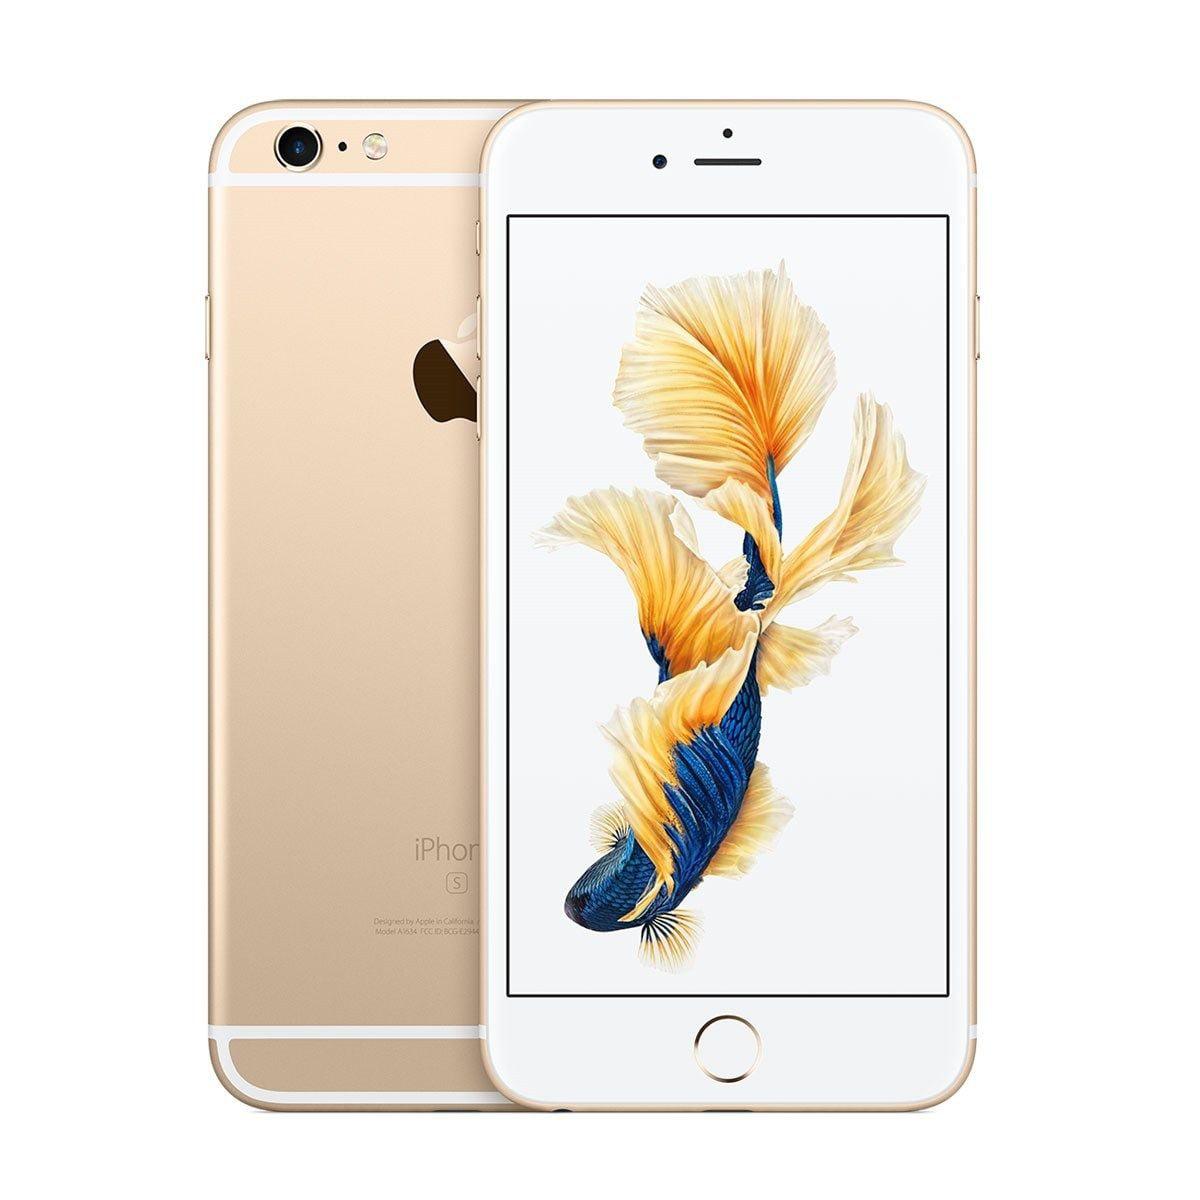 Seller Refurbished Apple iPhone 6S Plus 16GB Unlocked GSM iOS Smartphone Multi Colors (Rose Gold/White)